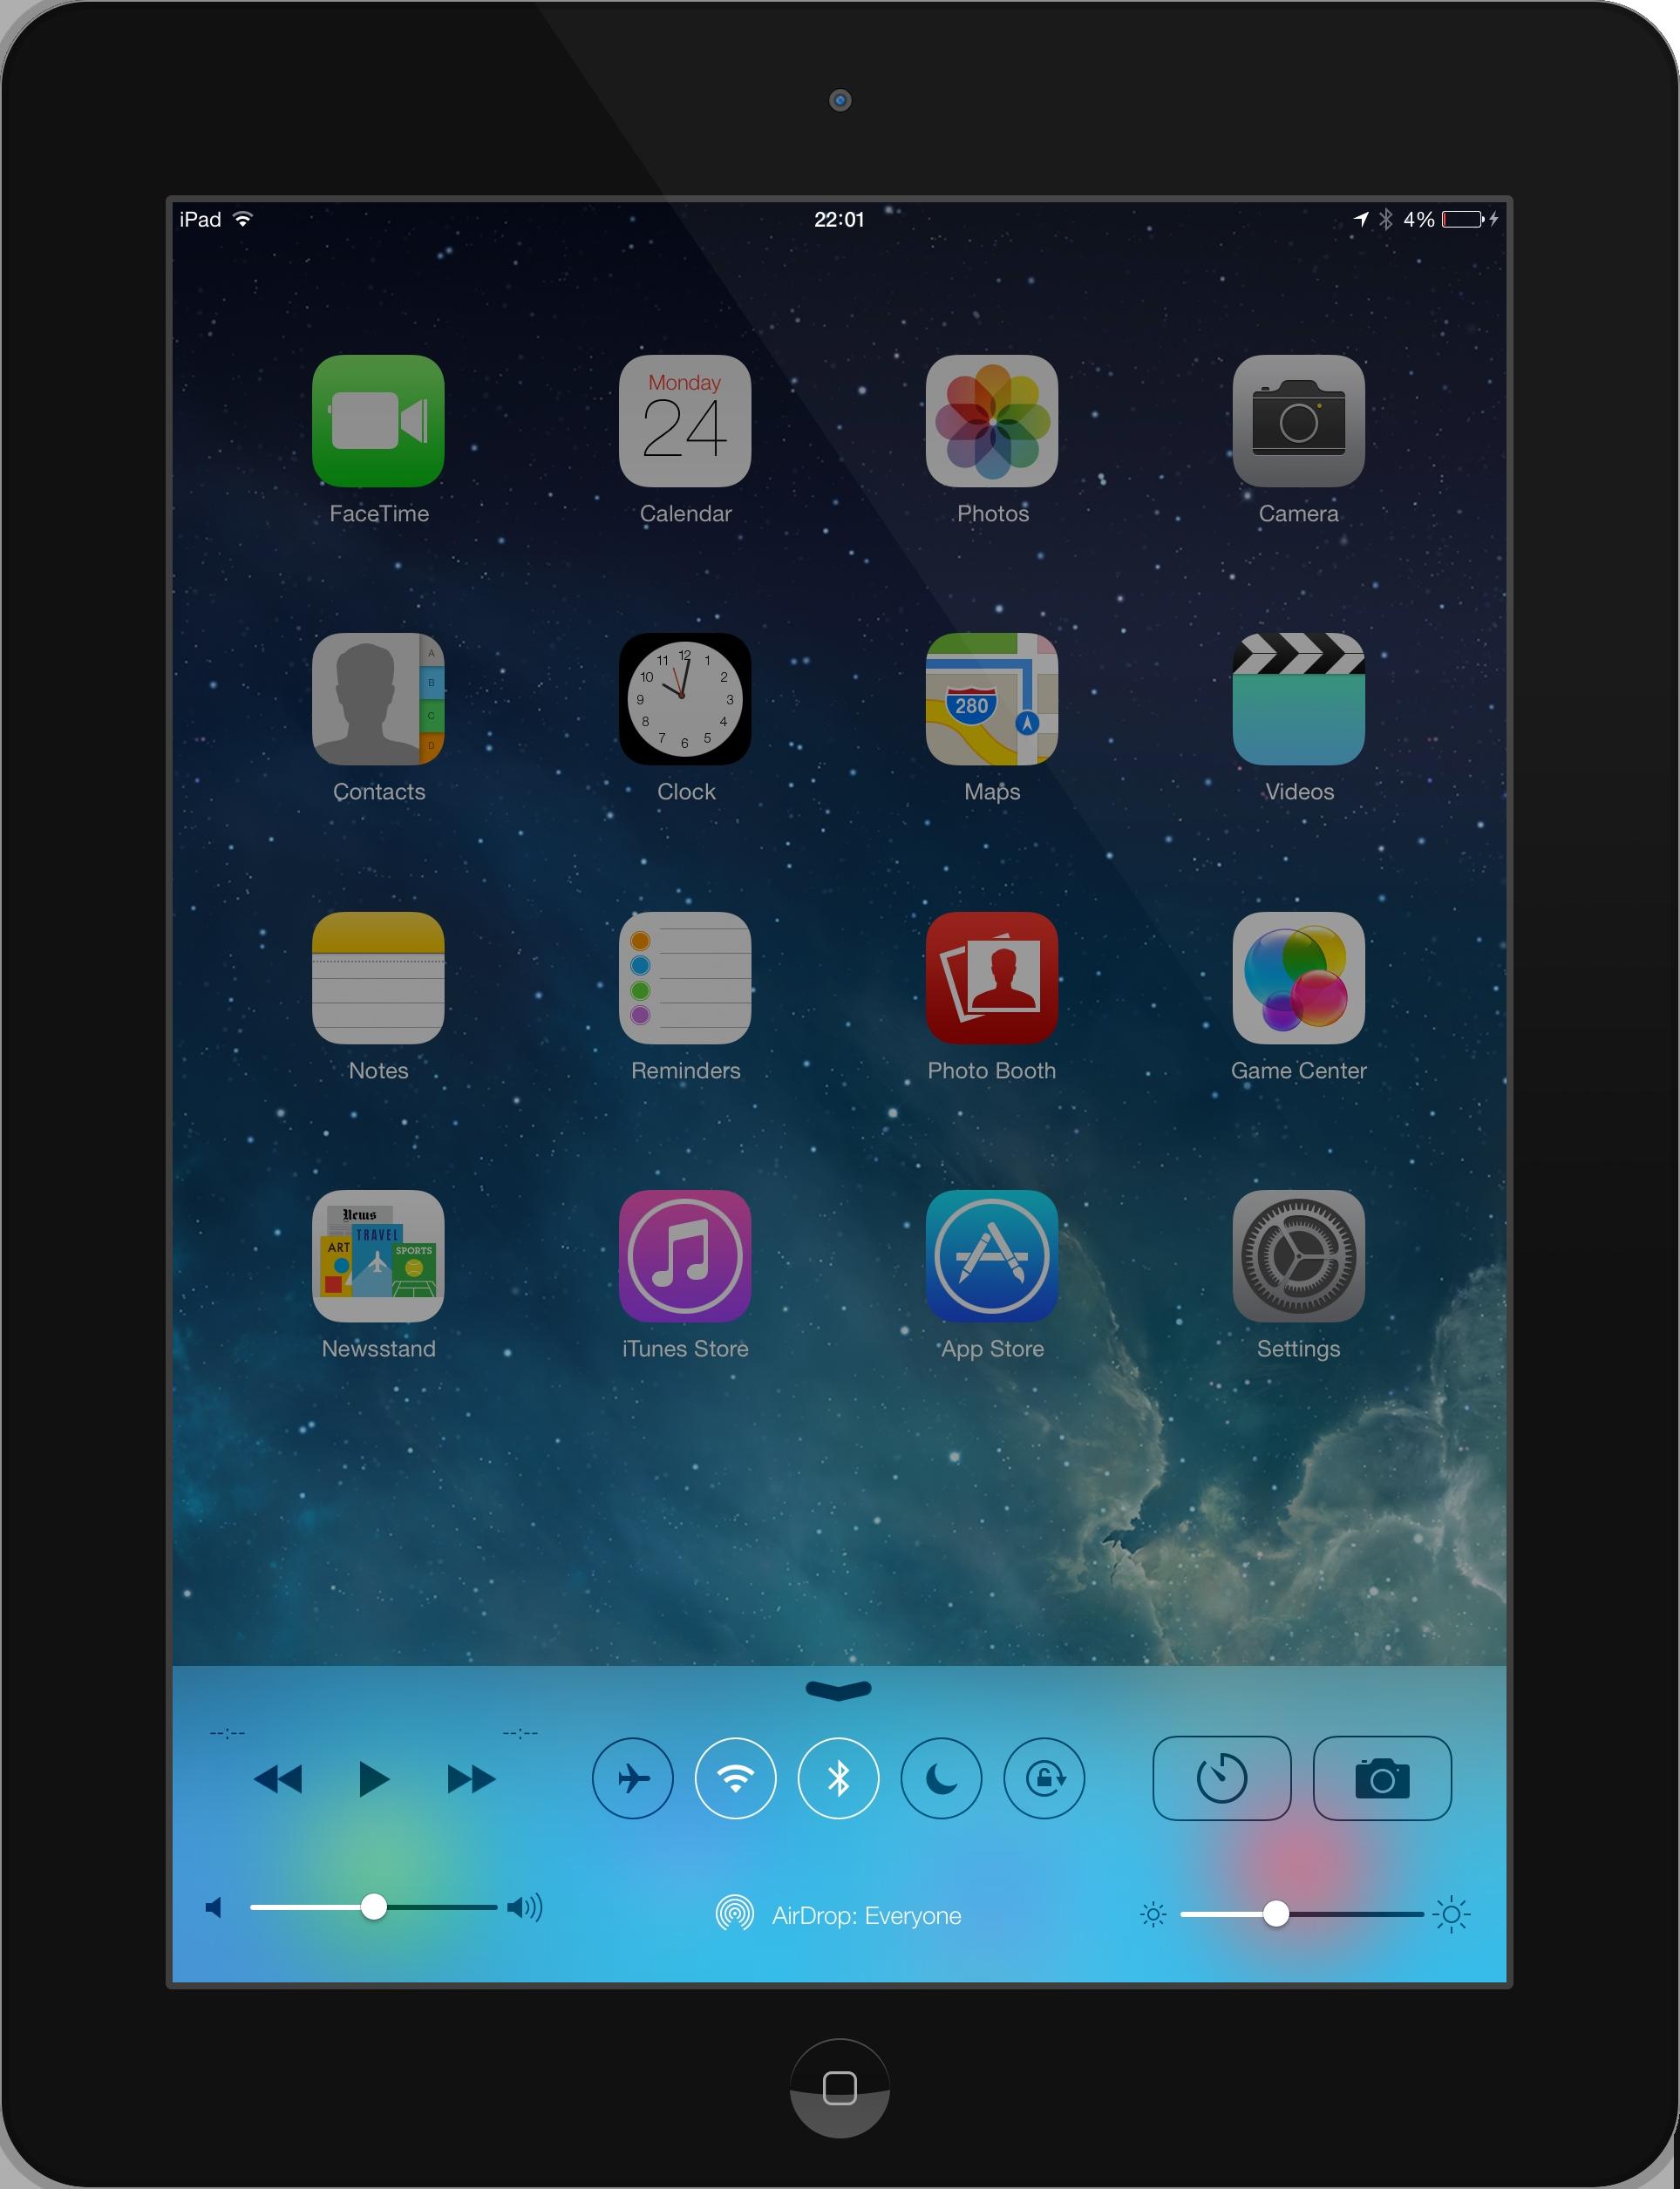 Ipad Mockup Psd Black Apple Ipad Mini Ipad Air New Apple Ipad